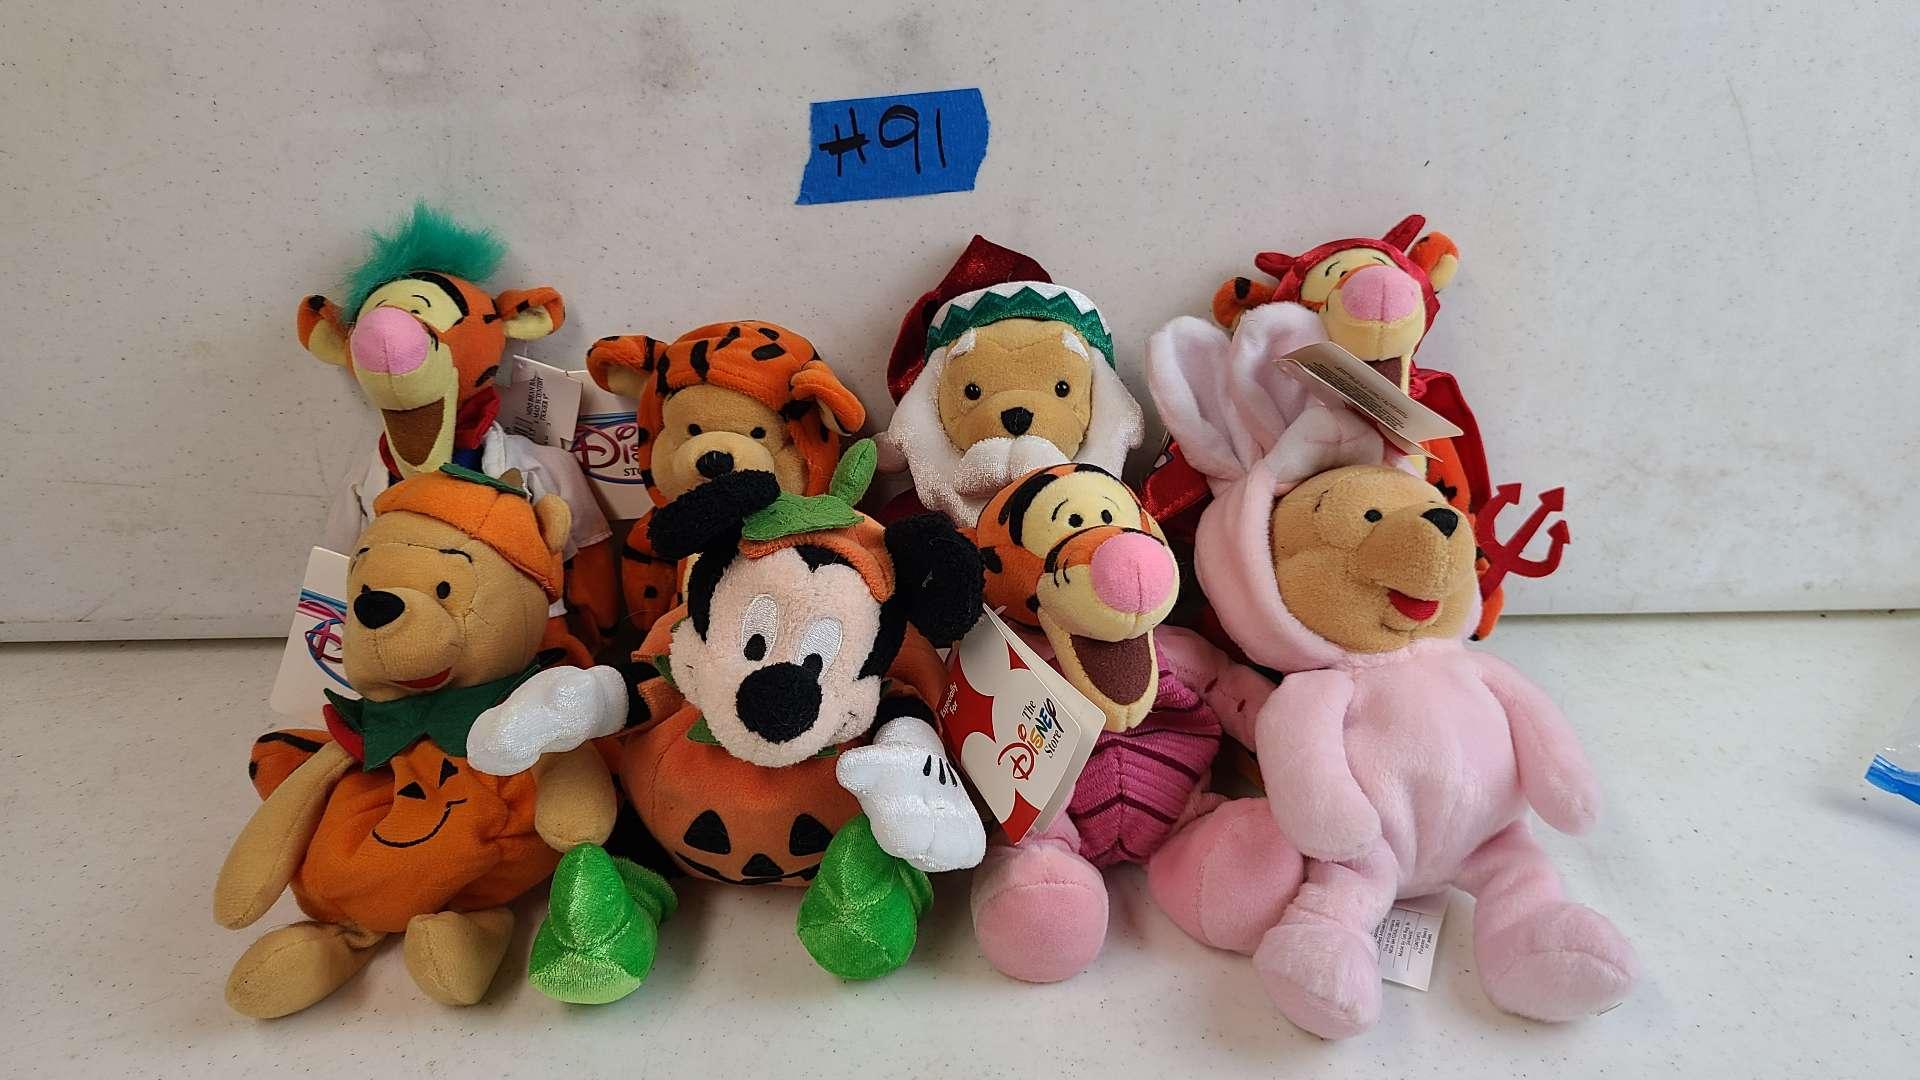 Lot # 91 Lot of Disney Plush Characters